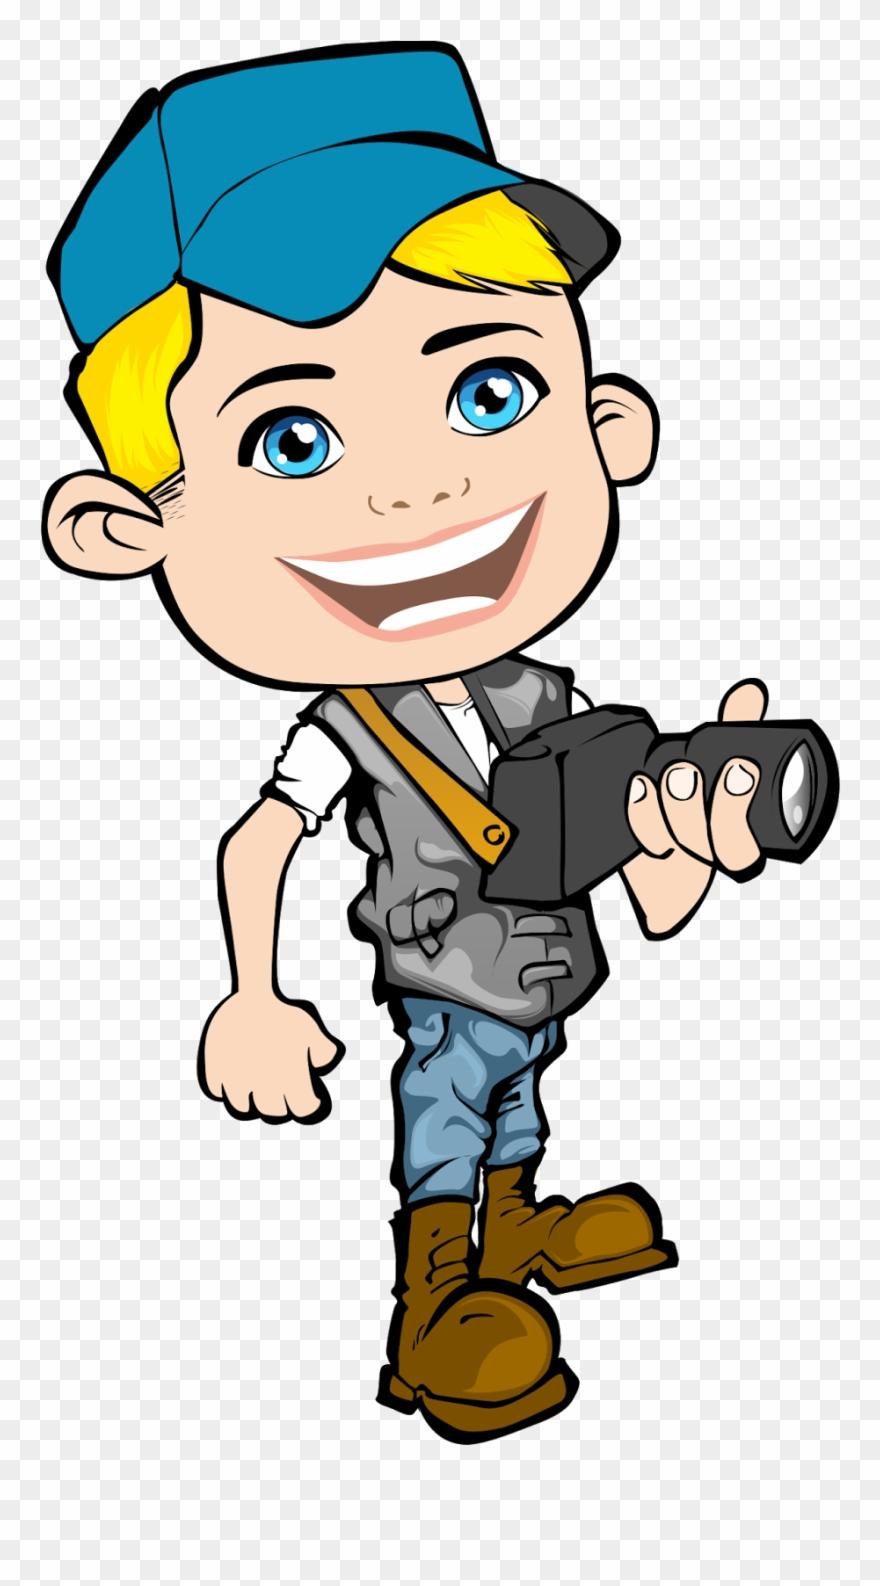 Clipart reporter picture Journalist Clipart Media Reporter - Journalist Clipart - Png ... picture